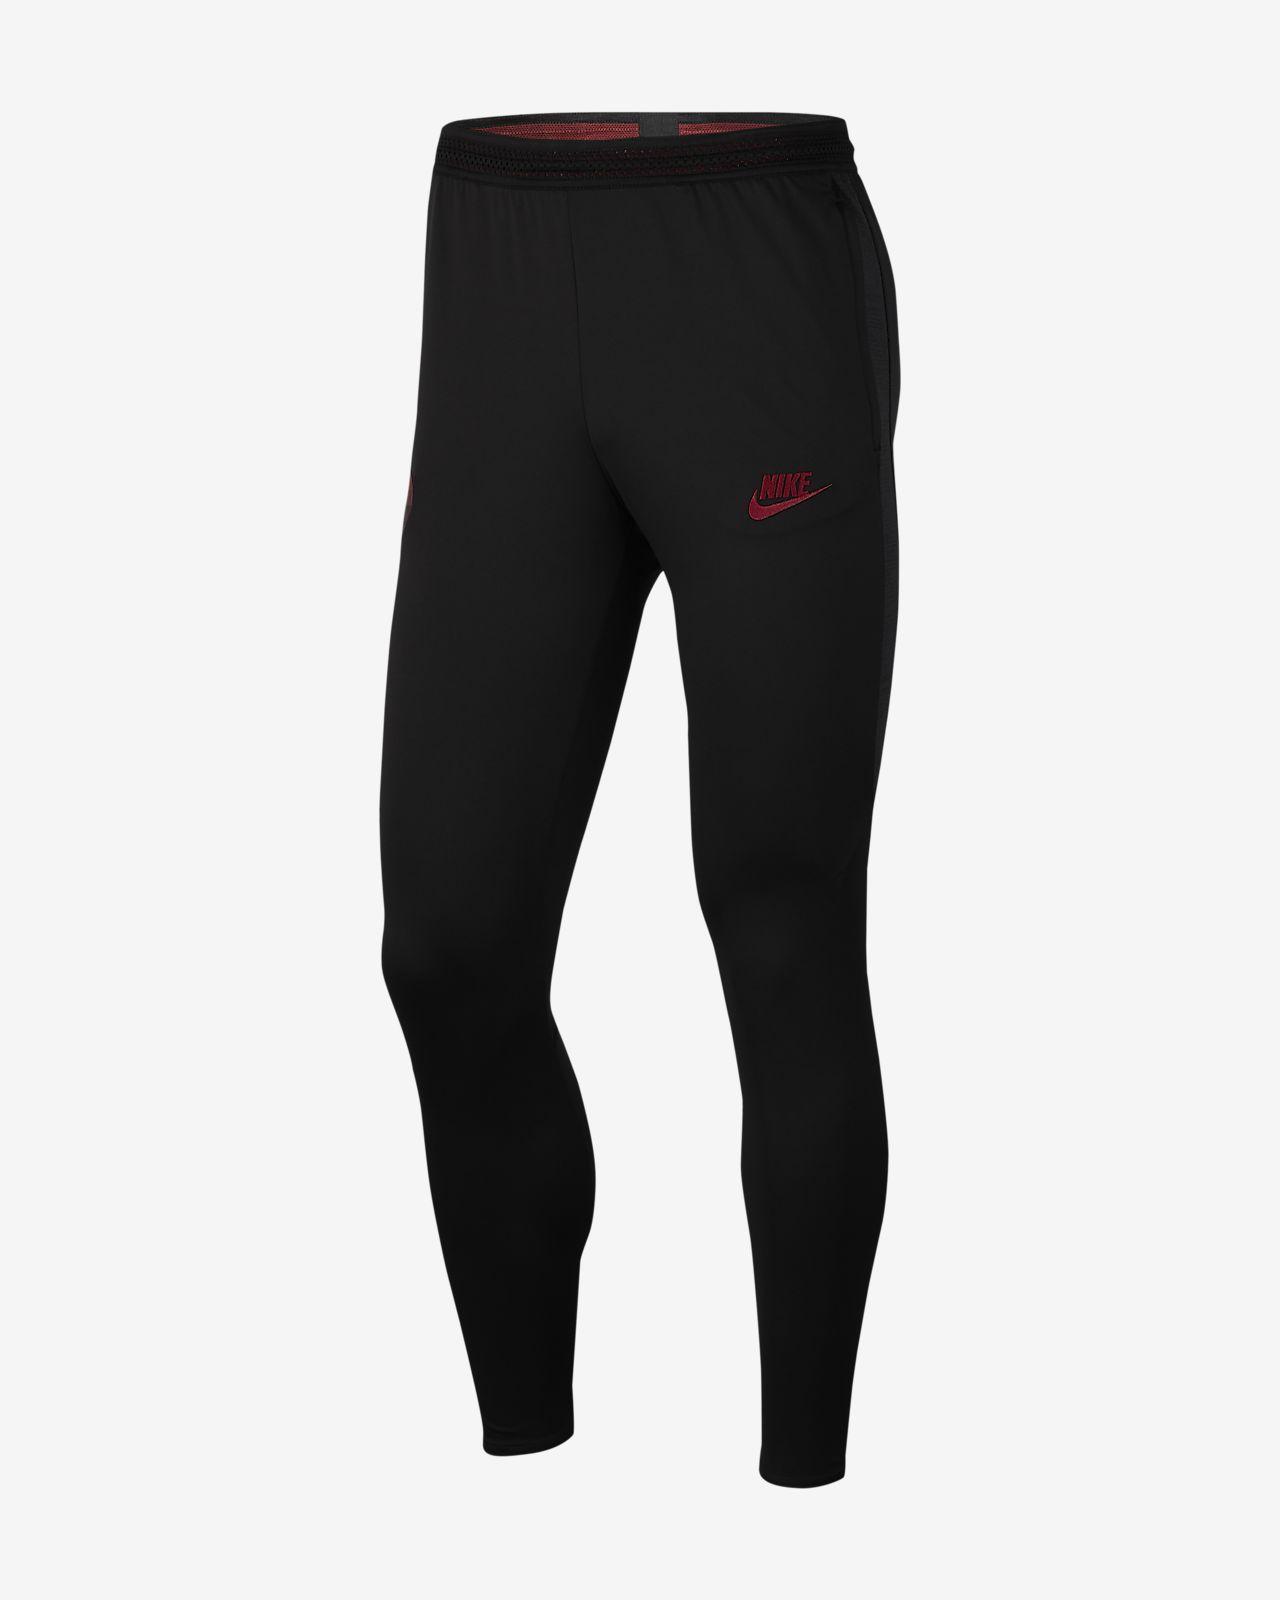 Nike Dri-FIT A.S. Roma Strike Men's Football Pants